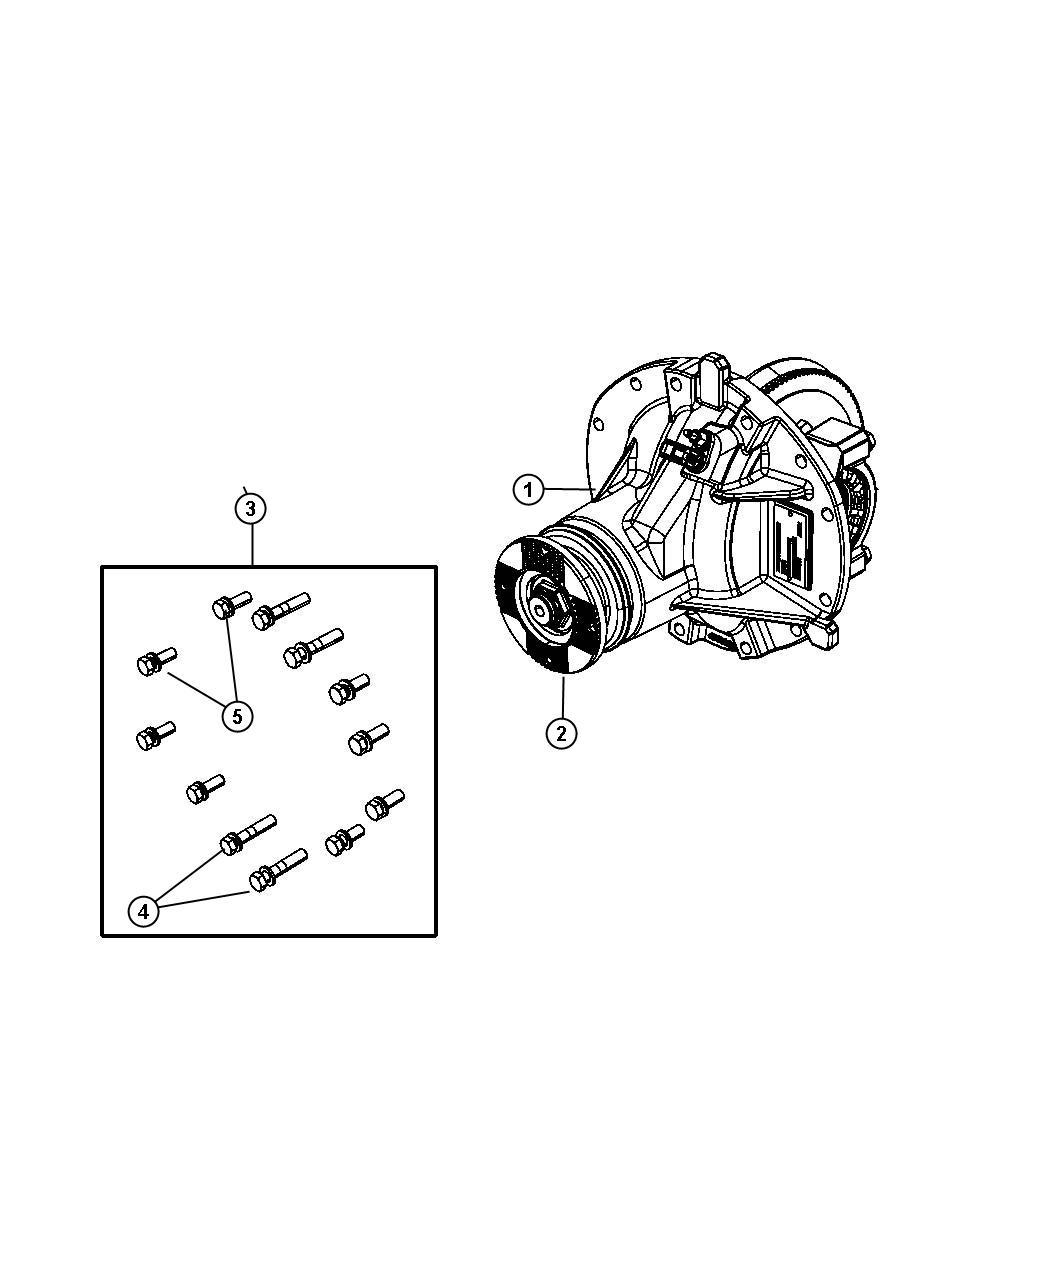 1999 dodge ram 1500 front axle diagram 2002 saturn sl1 fuel pump wiring rear schematic get free image about